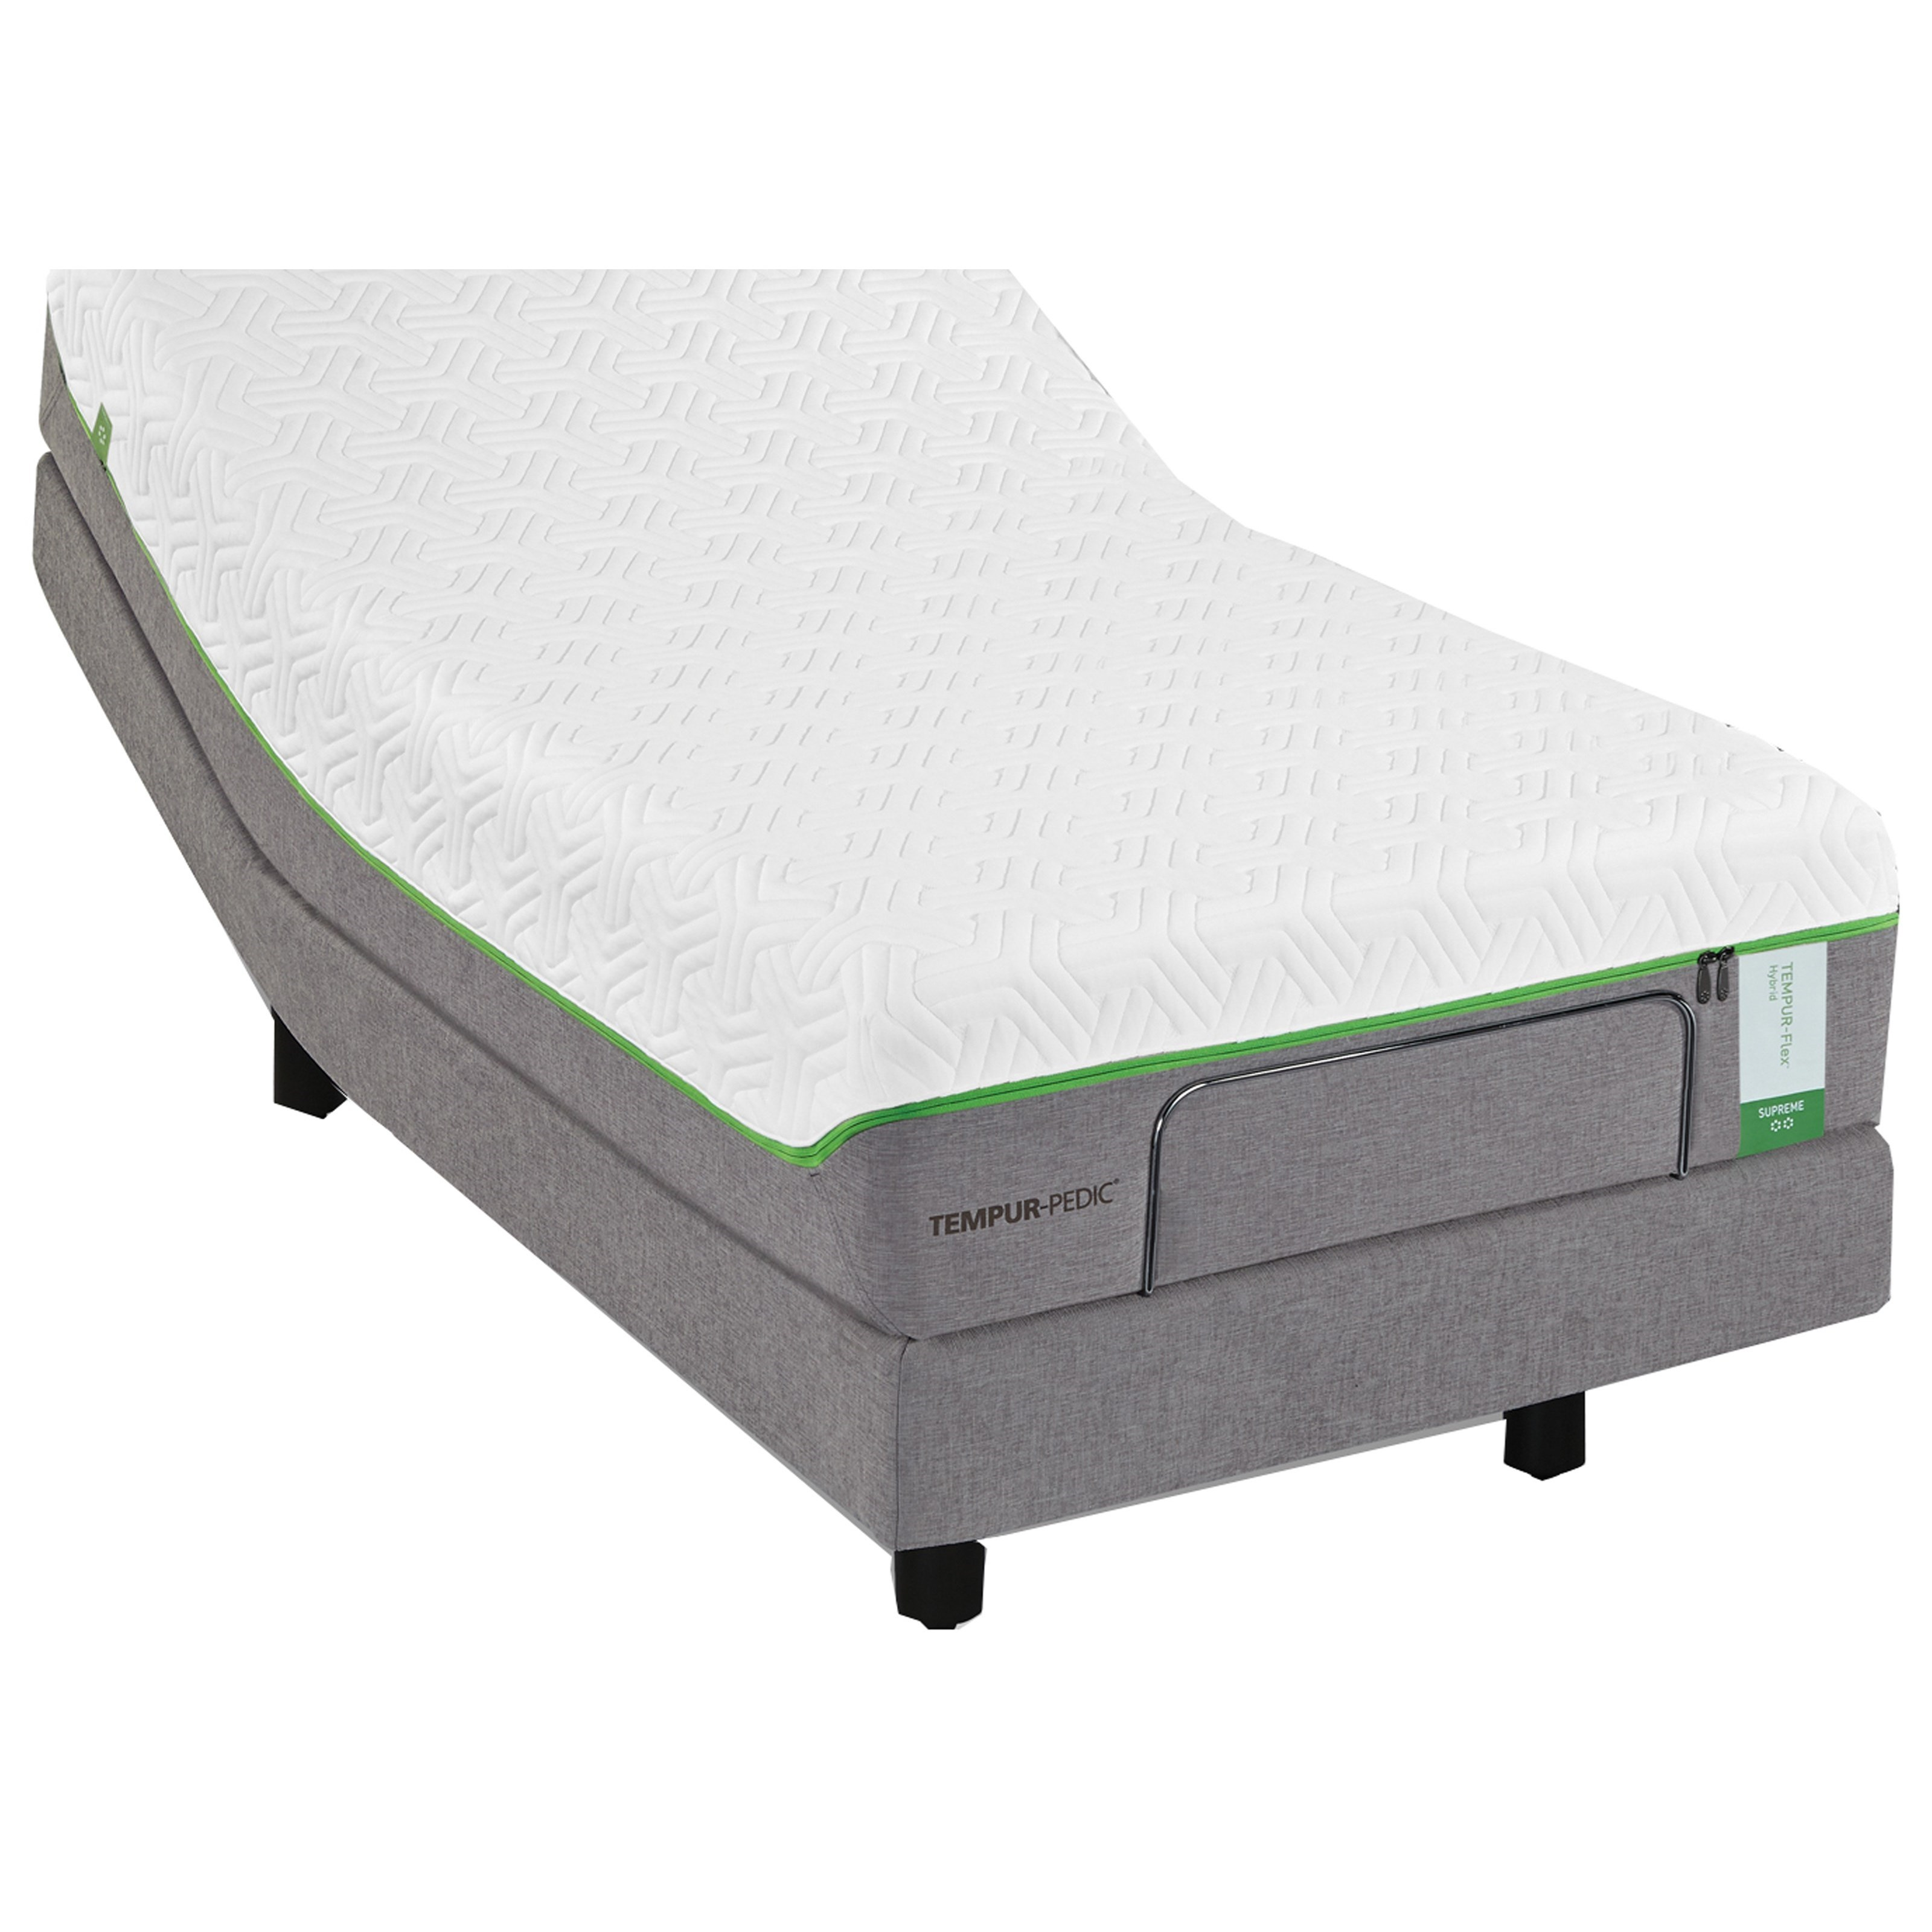 Tempur-Pedic® TEMPUR-Flex Elite Cal King Medium Soft Plush Mattress Set - Item Number: 10117180+2x25565290